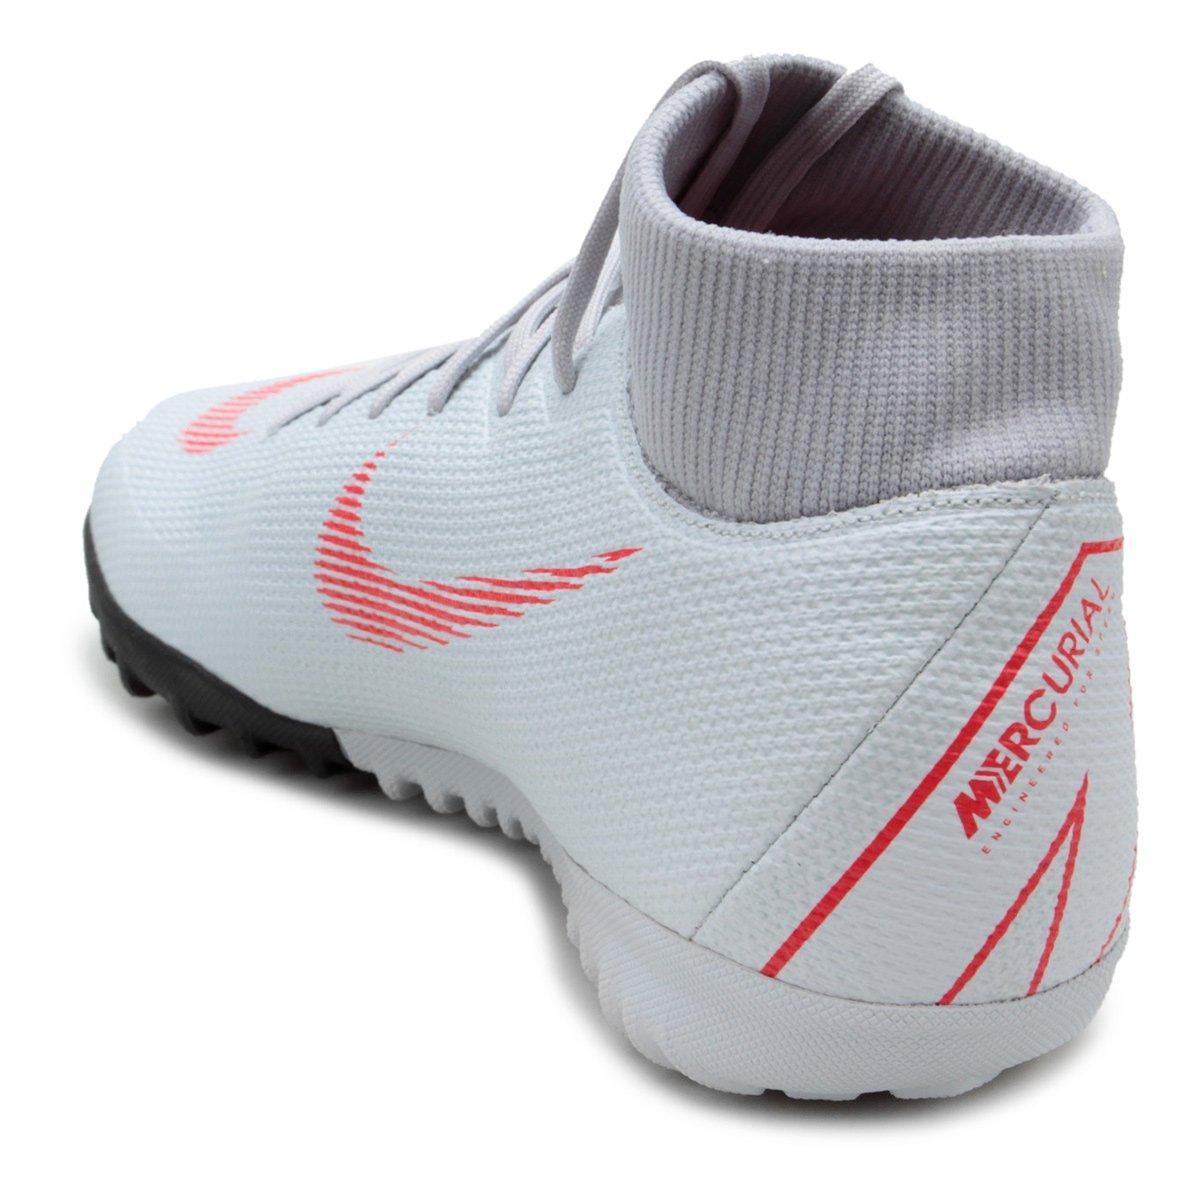 d1a93e0cb0245 ... Foto 2 - Chuteira Society Nike Mercurial Superfly 6 Academy Masculina